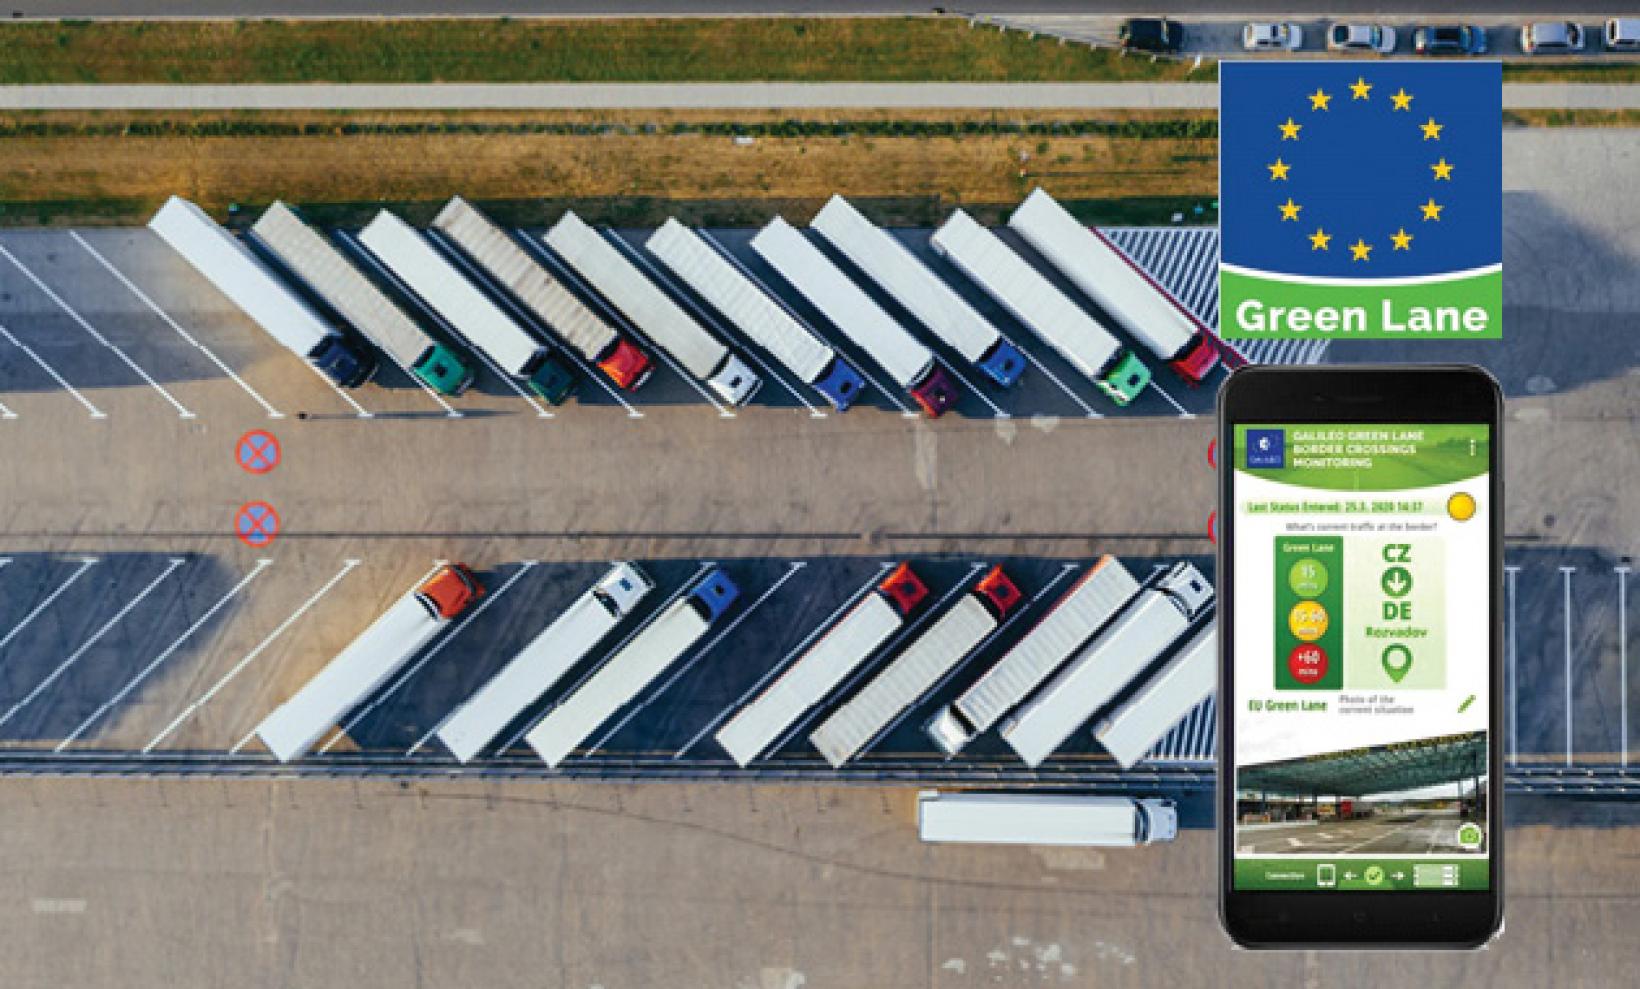 Galileo Green Lane will help reduce freight bottlenecks at EU borders